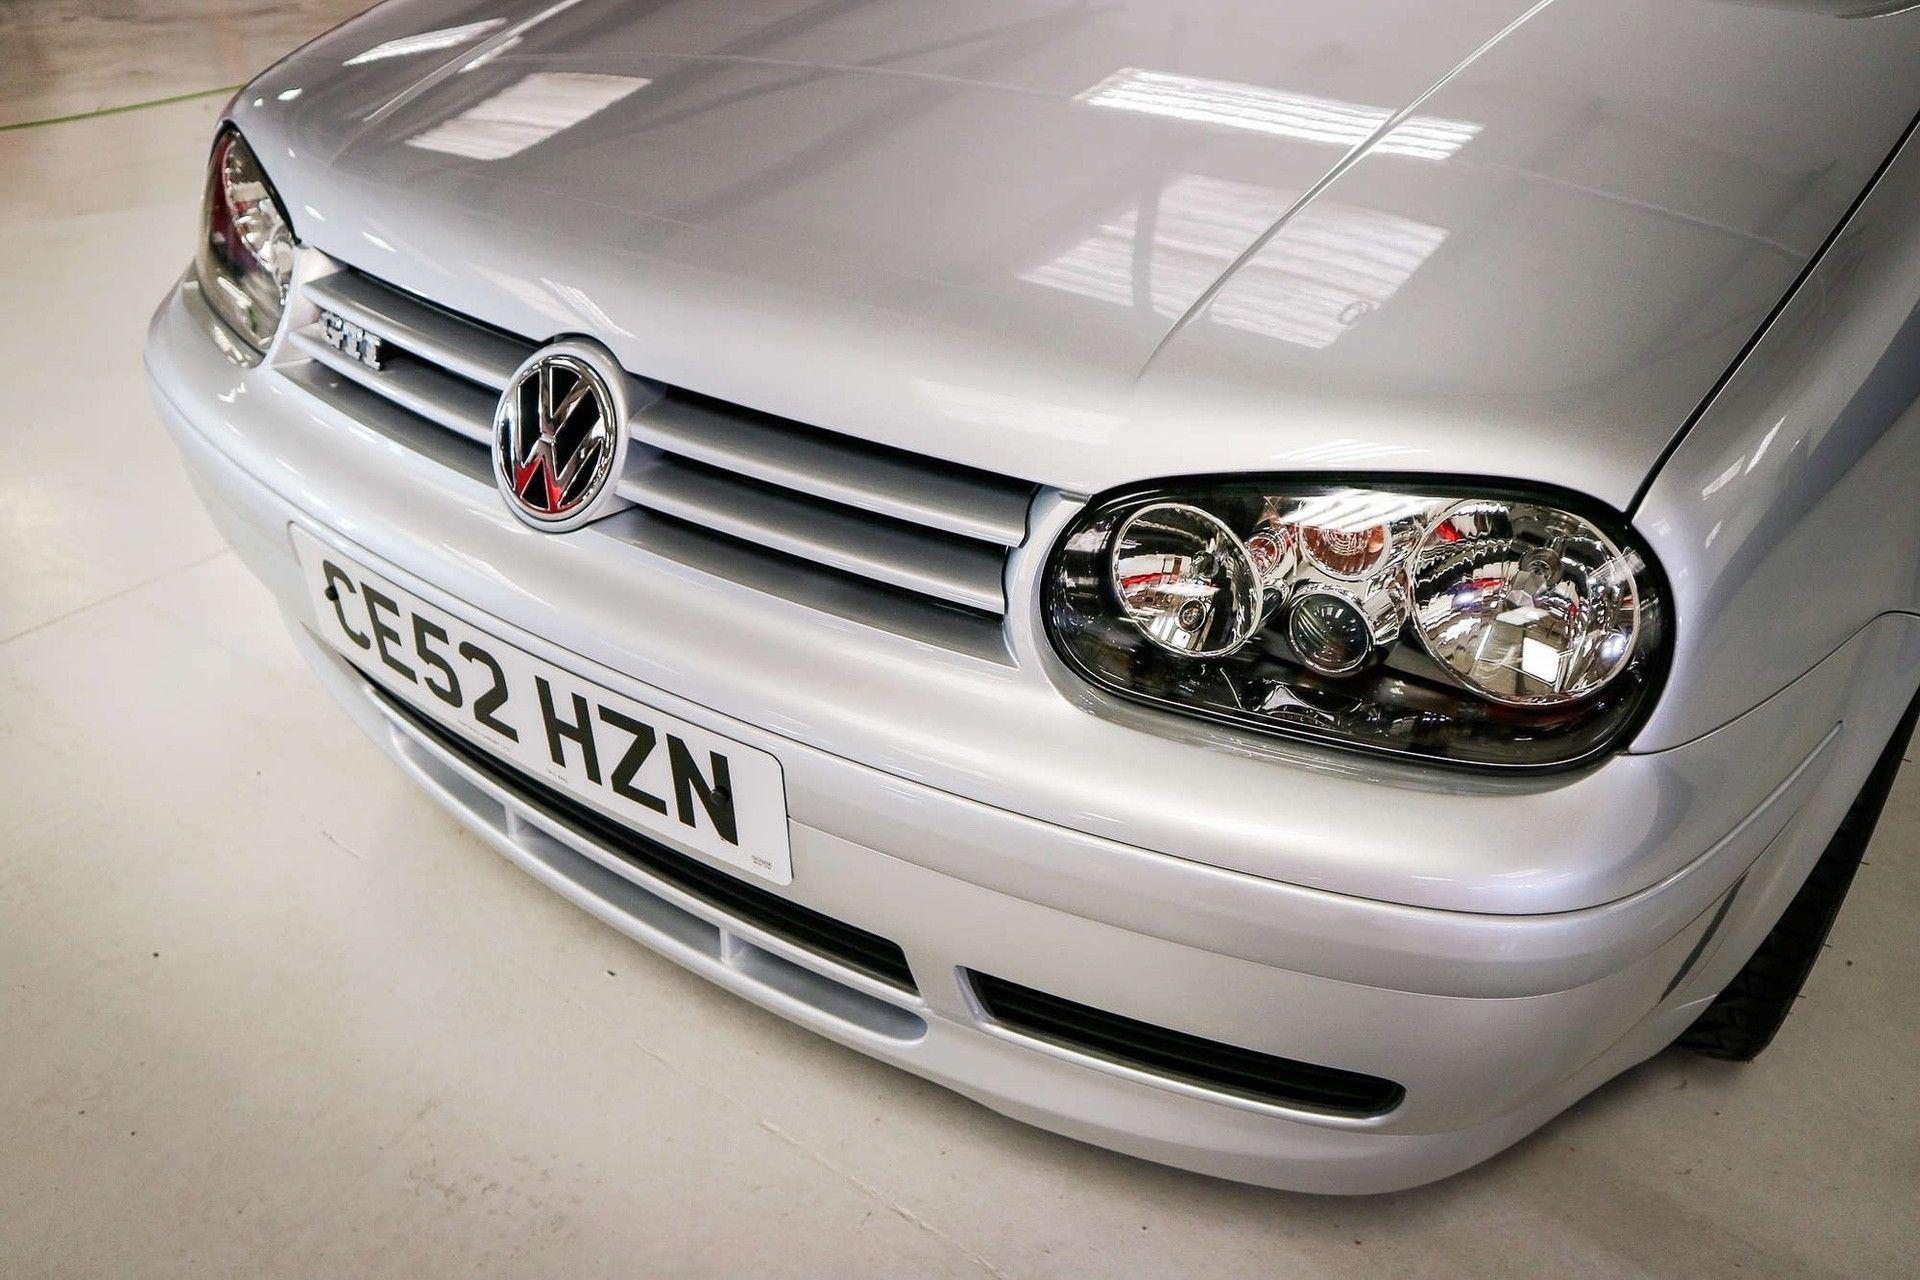 2002_VW_Golf_GTI_25th_Anniversary_Edition_sale-0027